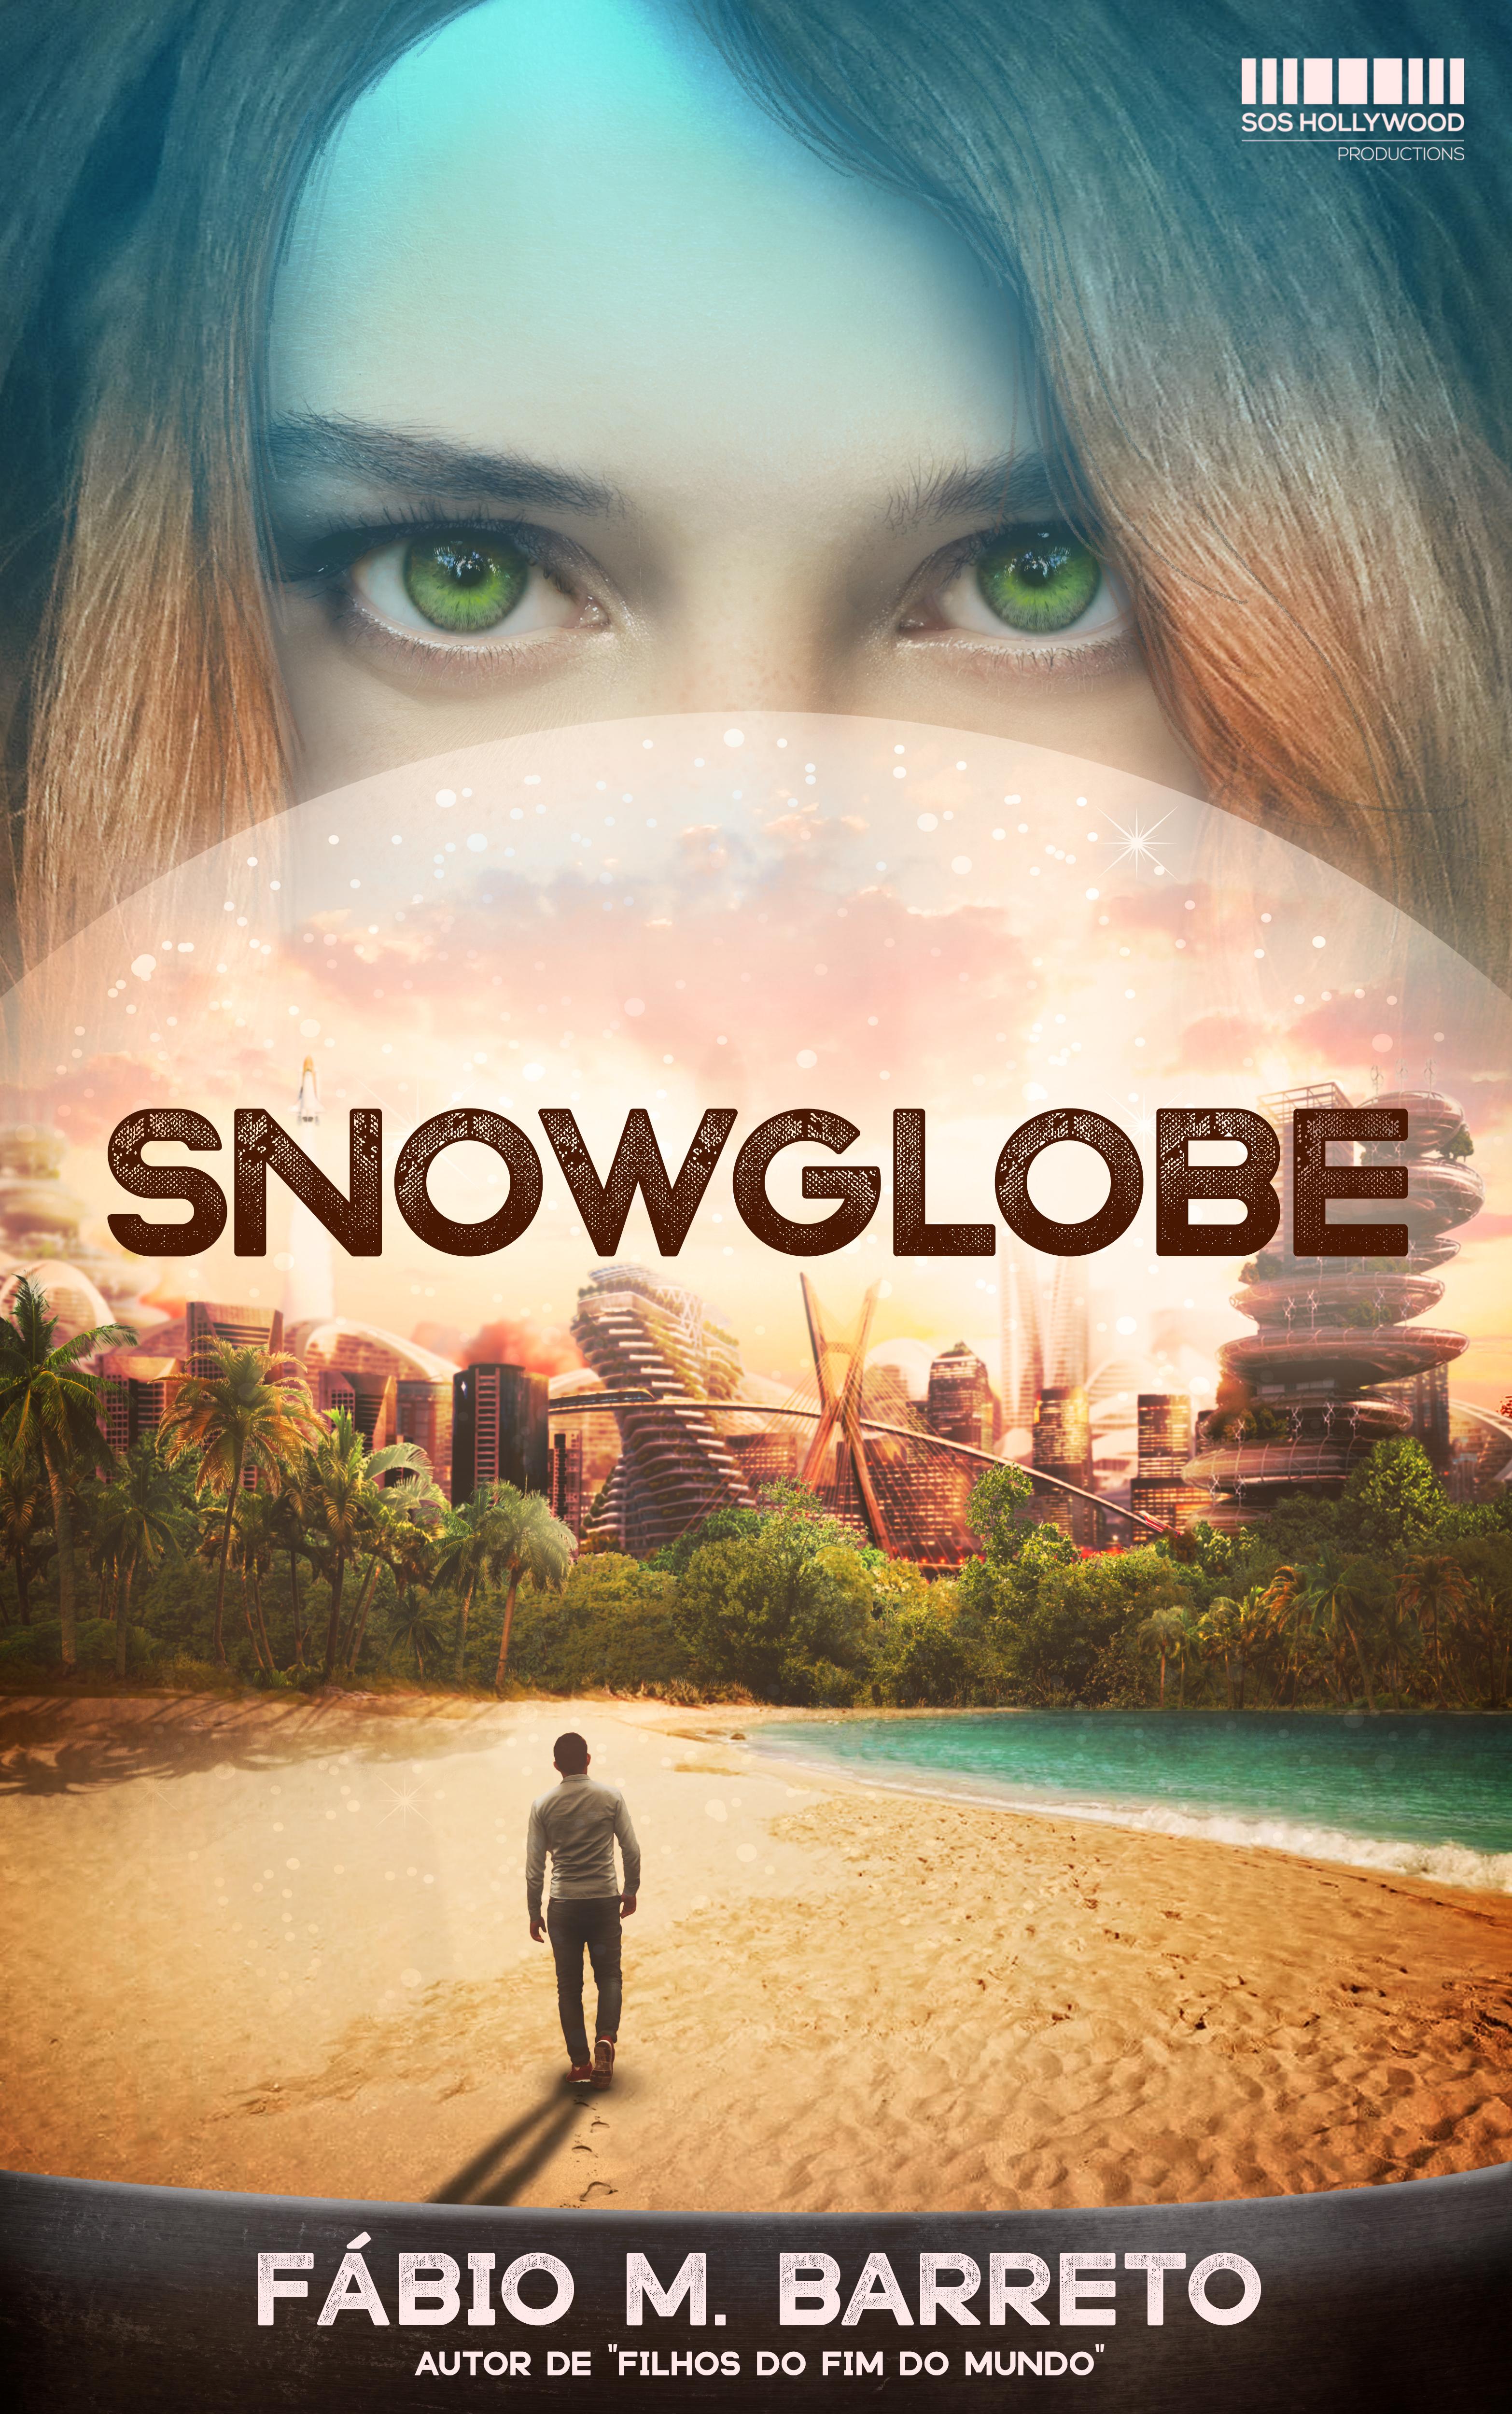 Capa Snowglobe